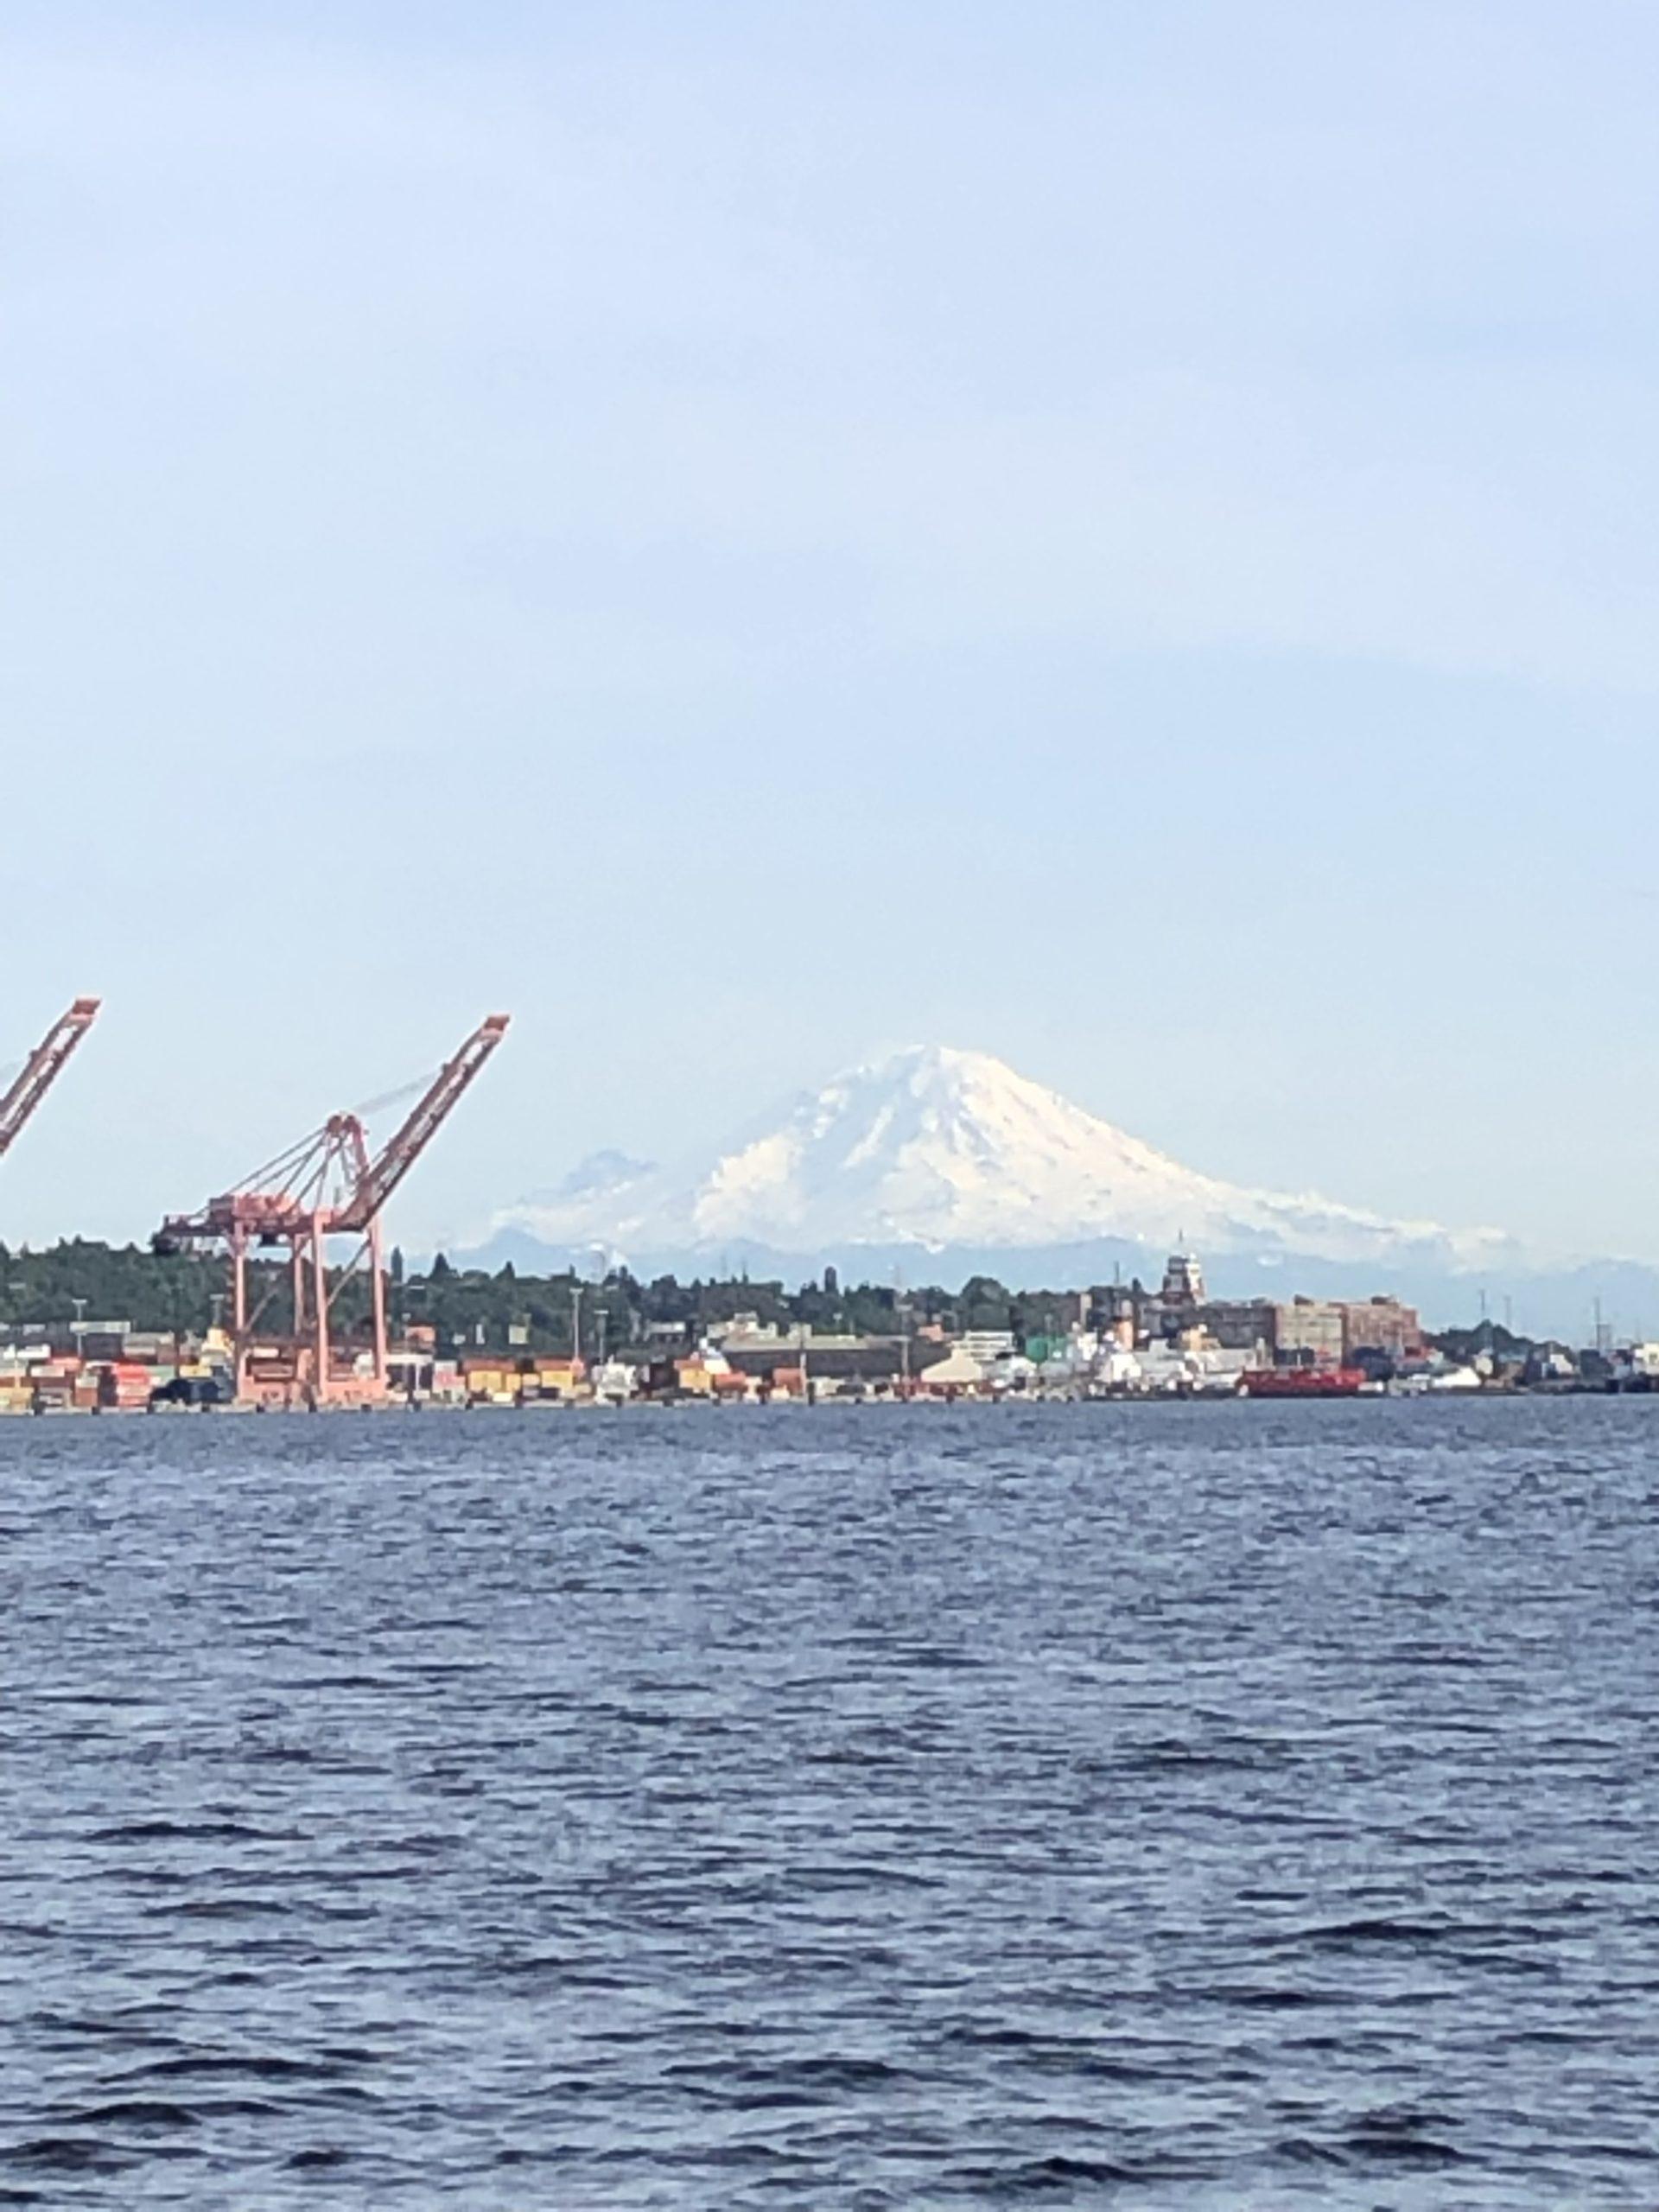 Visiter Seattle en 3 jours